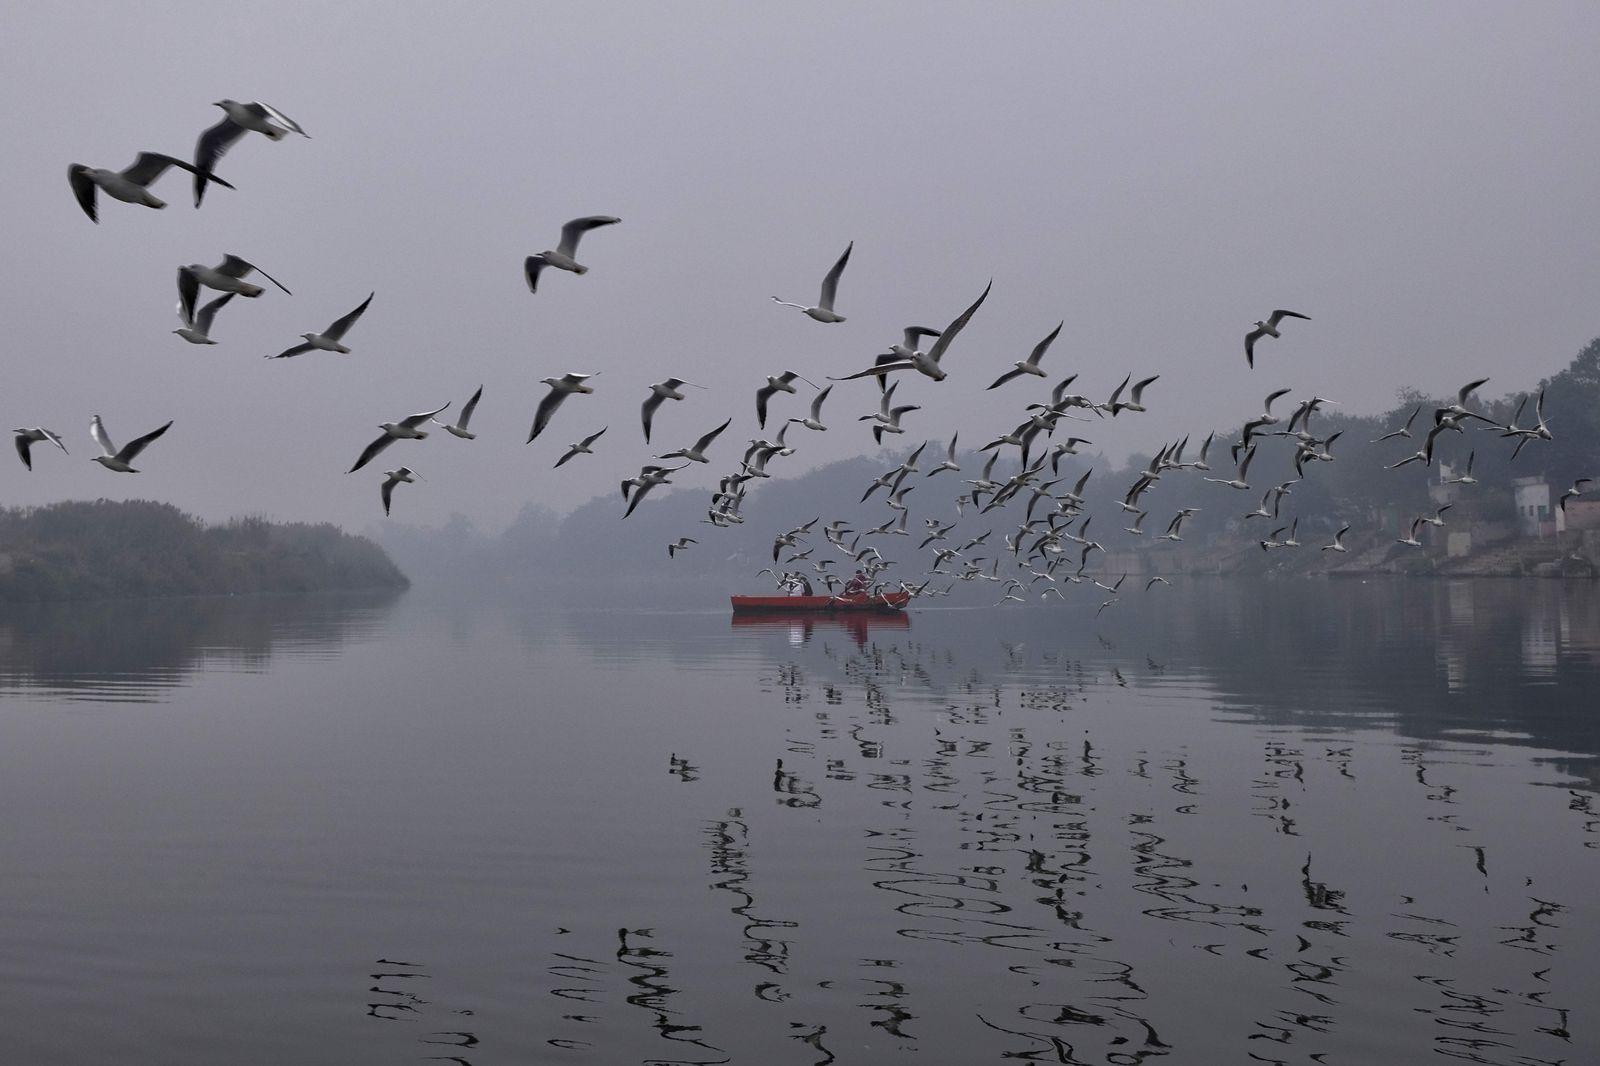 TOPSHOT-INDIA-ENVIRONMENT-POLLUTION-BIRDS